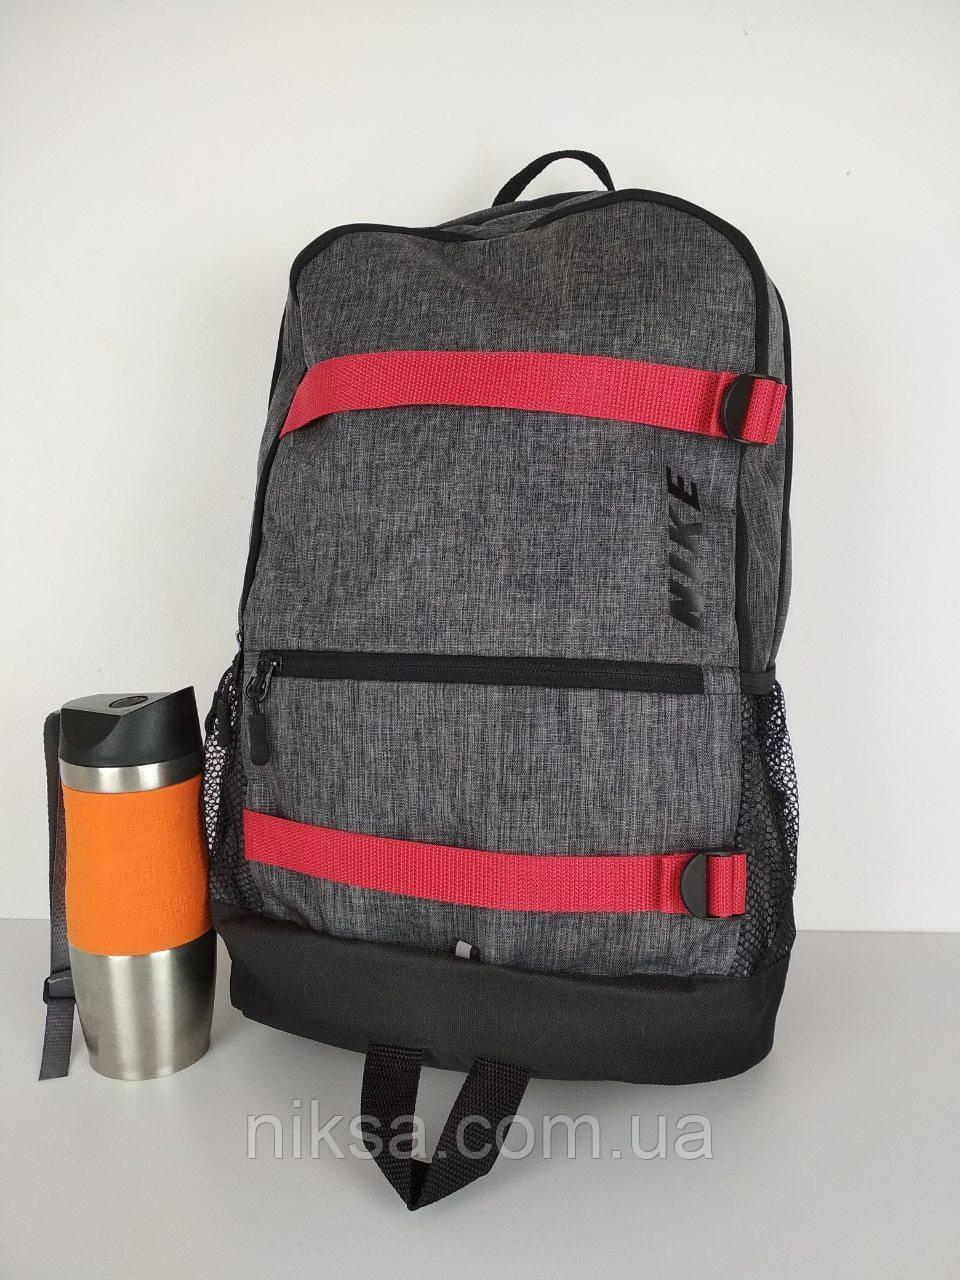 Рюкзак городской Nike, Reebok размер 45x30x15